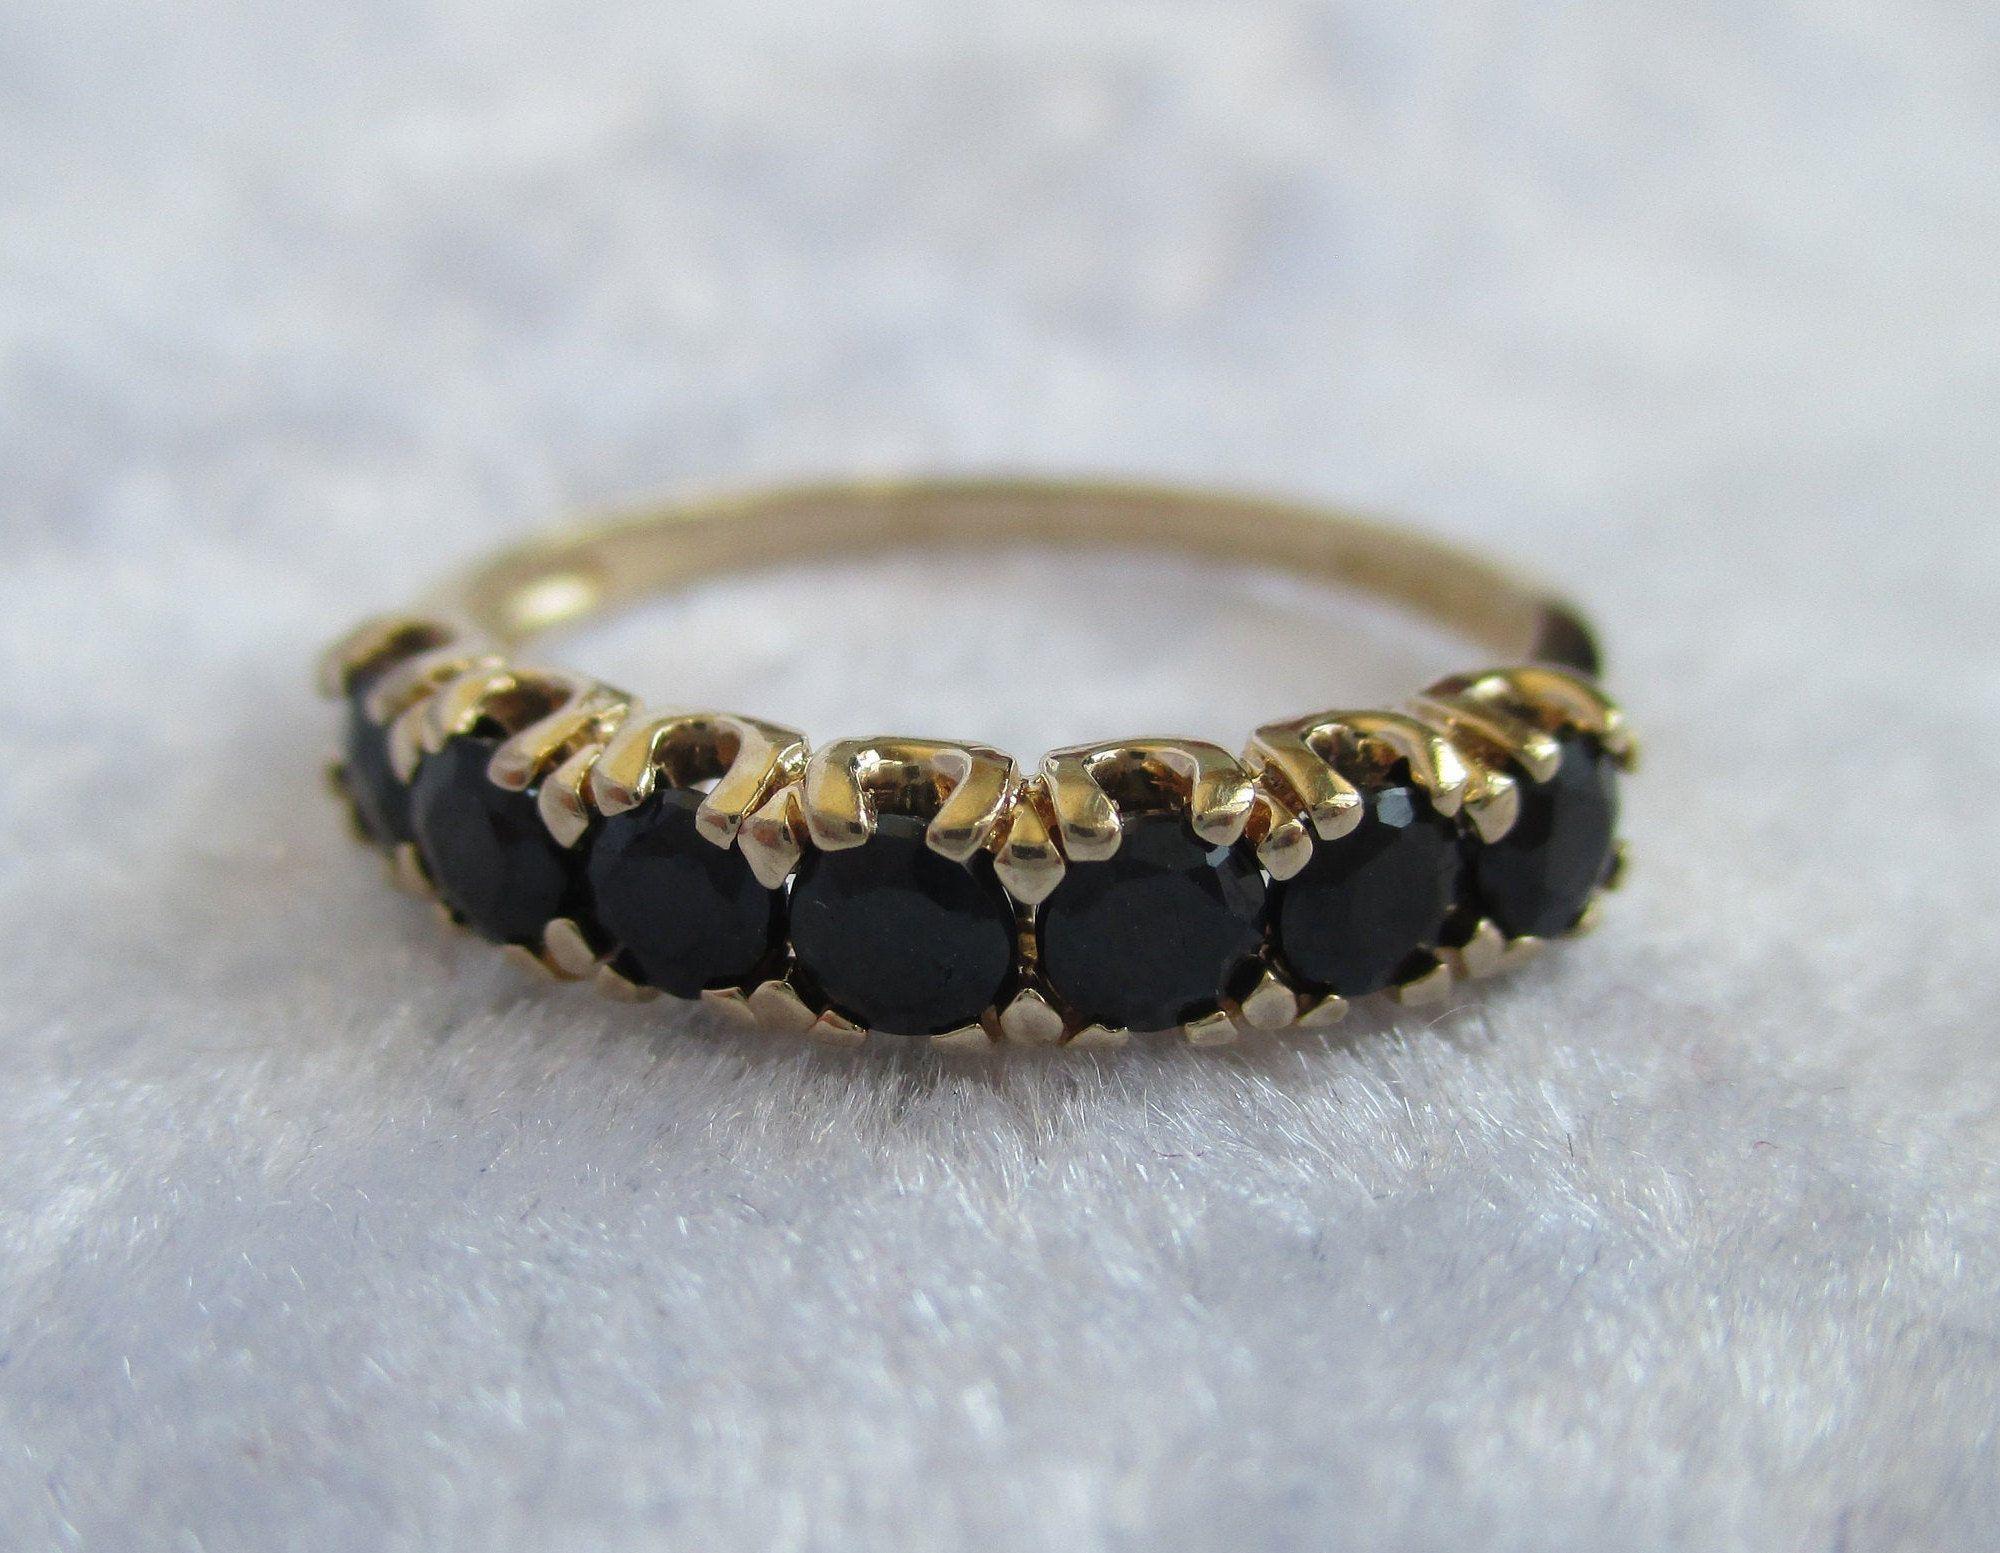 Vintage Sapphire 10k Gold Ring Clyde Dunier 10k Gold Sapphire In 2020 Vintage Sapphire Gold Sapphire Ring 10k Gold Ring